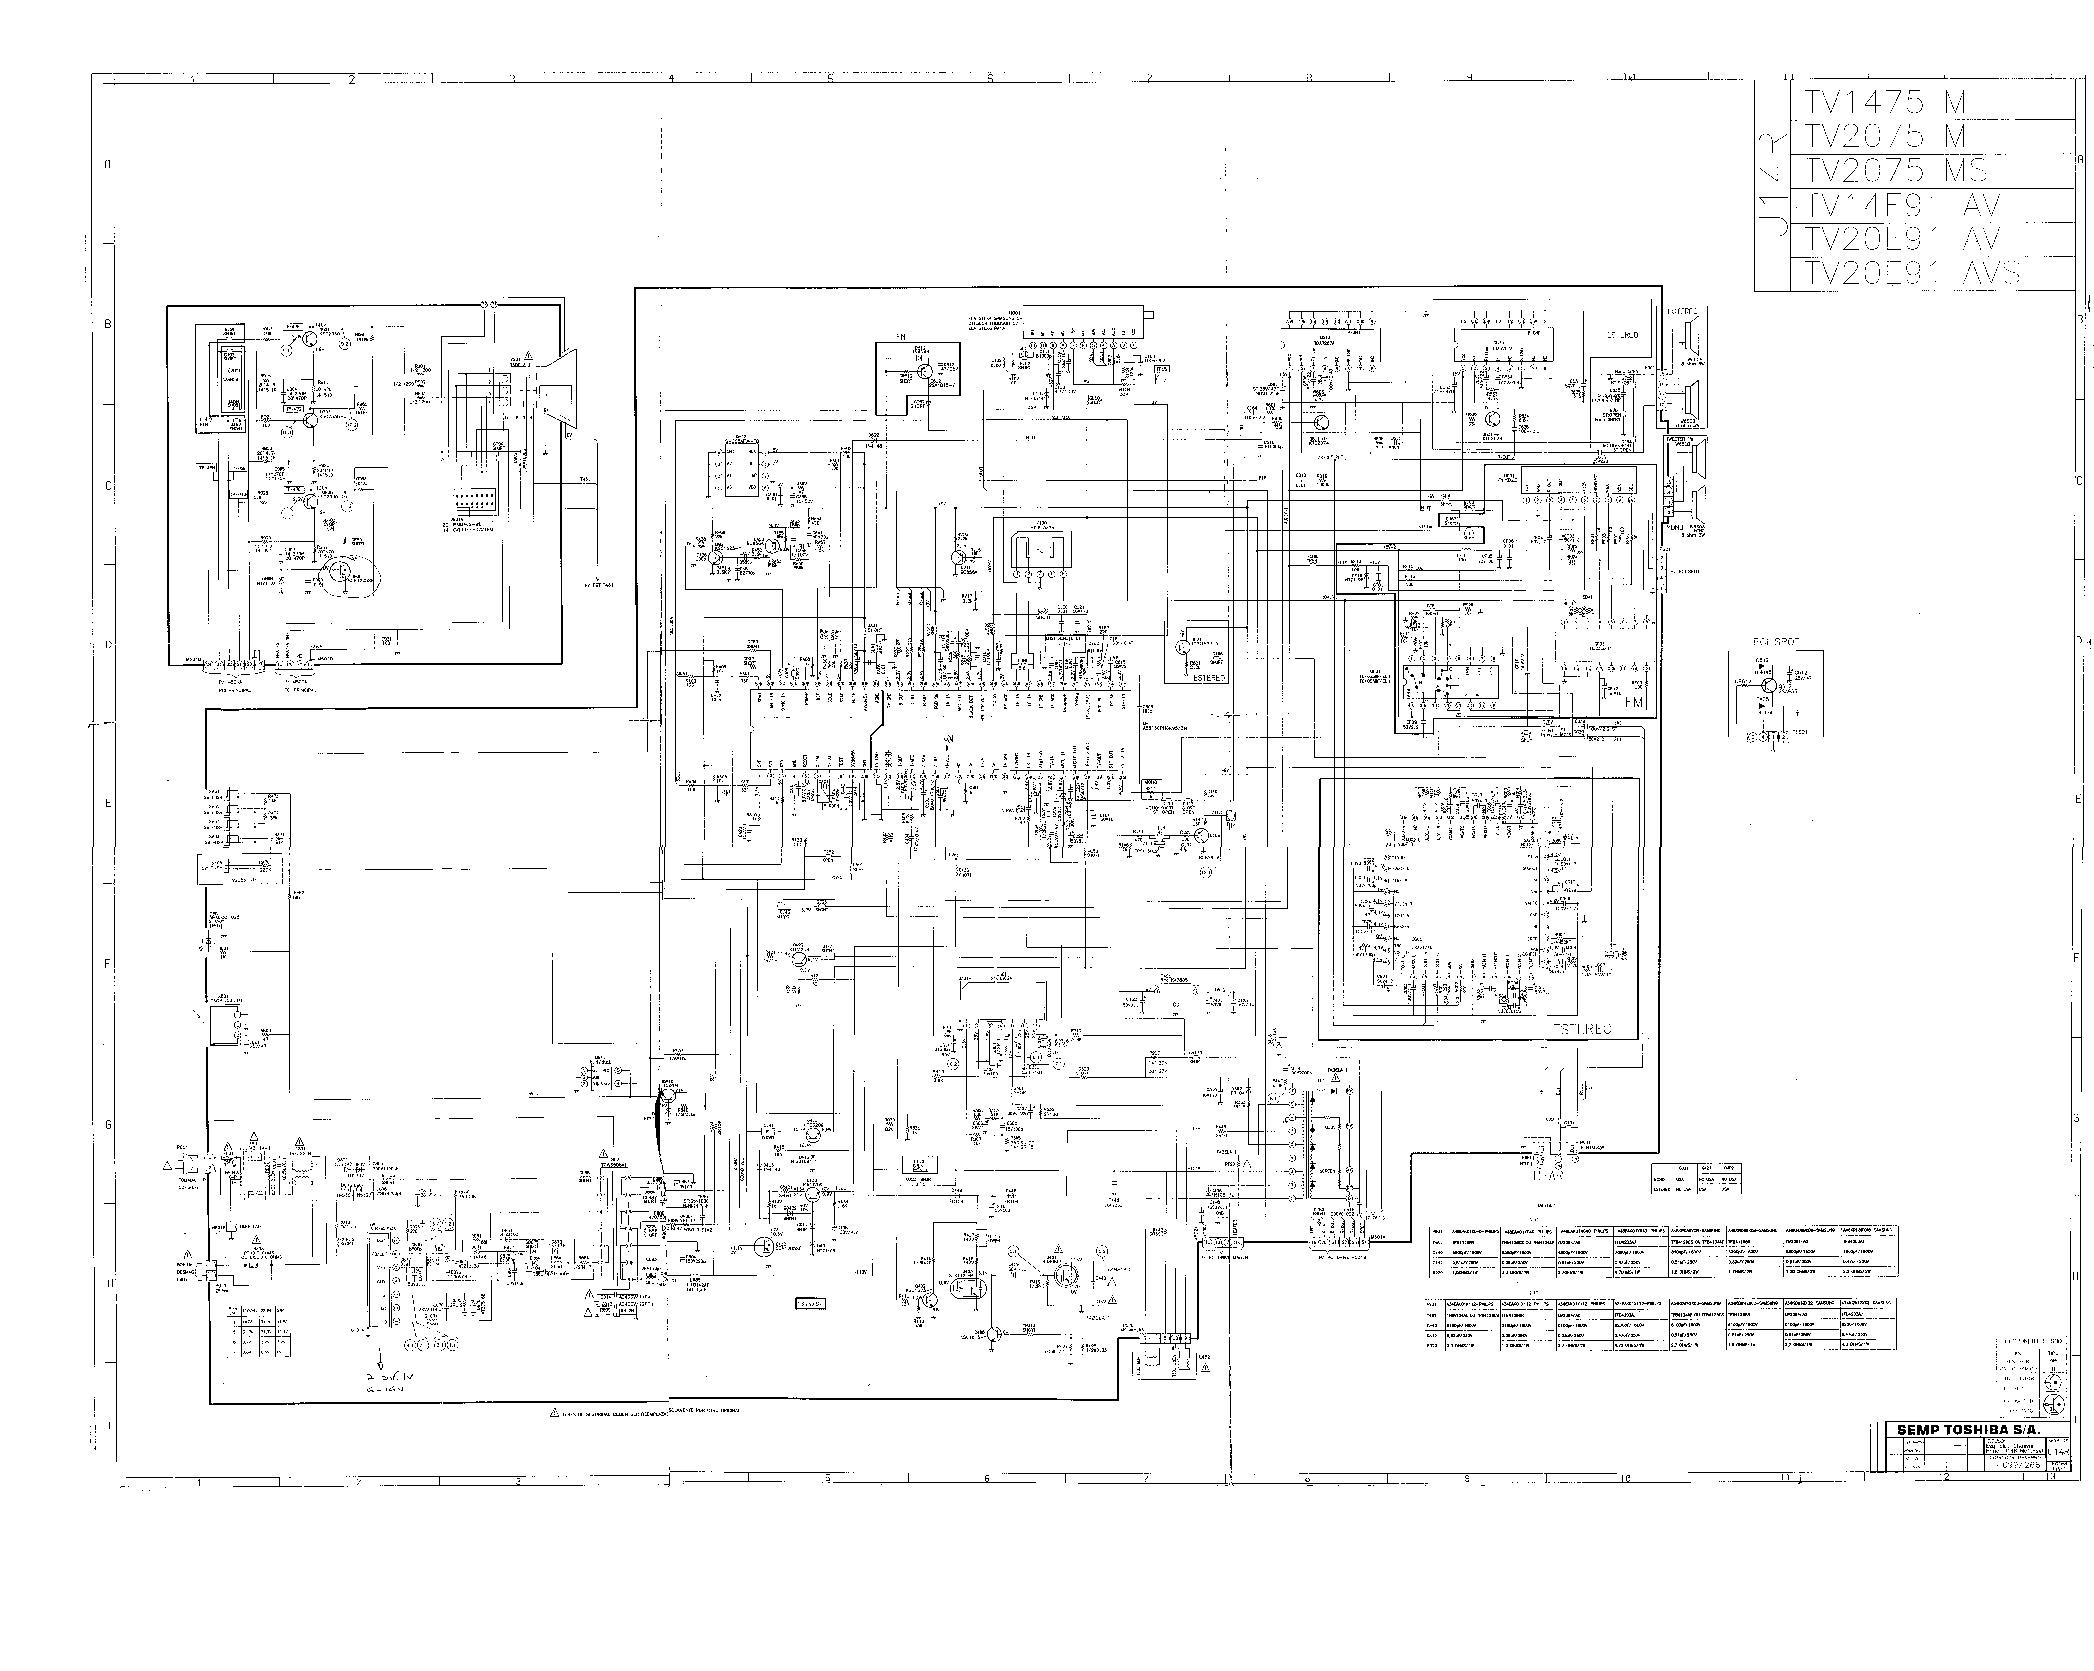 Toshiba Diagrama Toshiba 2075 Chasis U14R pdf Diagramas de